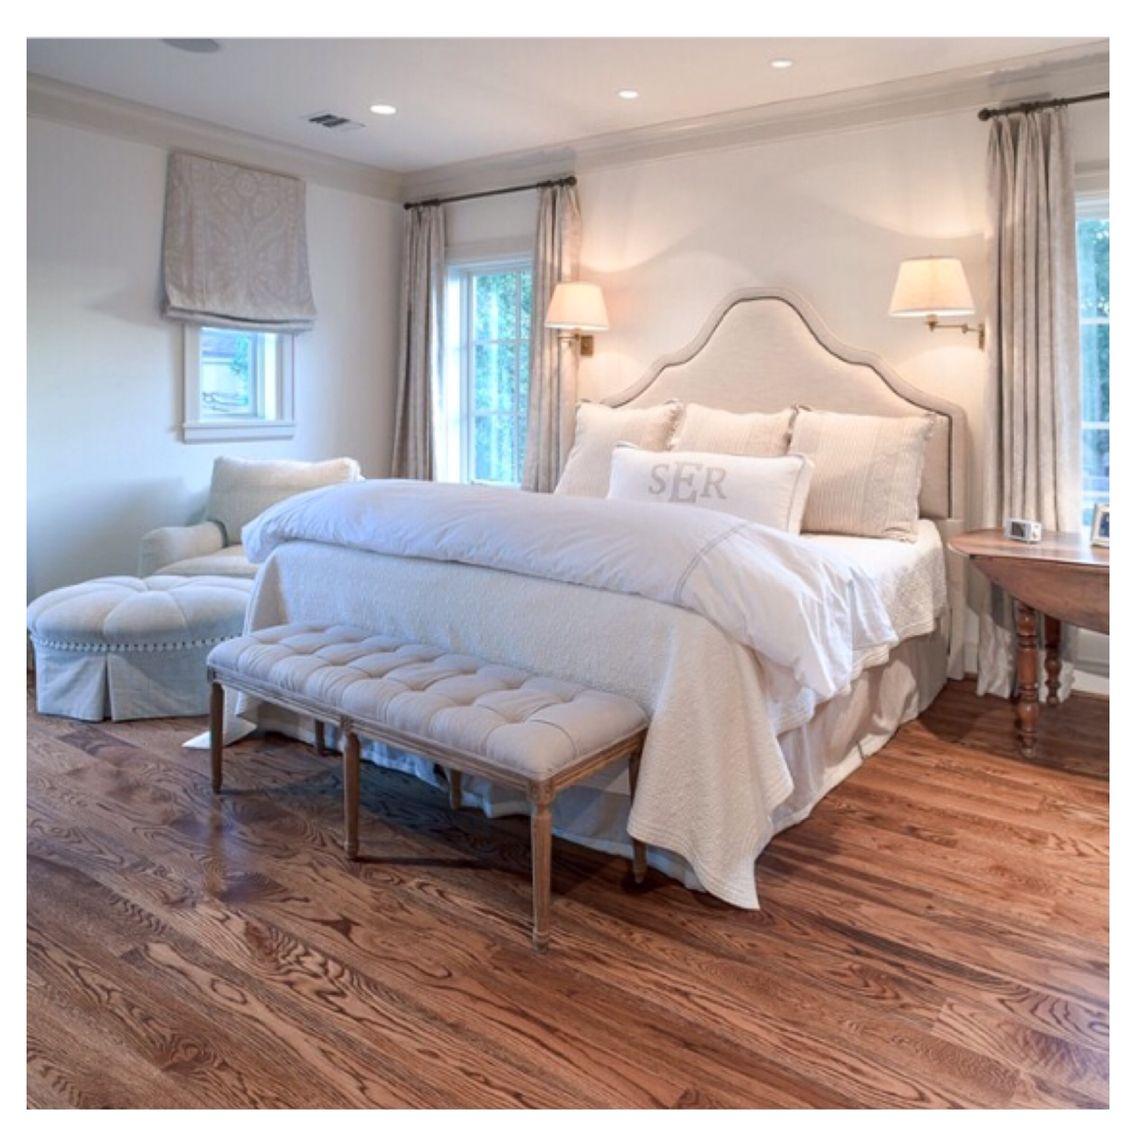 Master bedroom gray walls  Pretty  Bedroom goals  Pinterest  Bedrooms Master bedroom and House